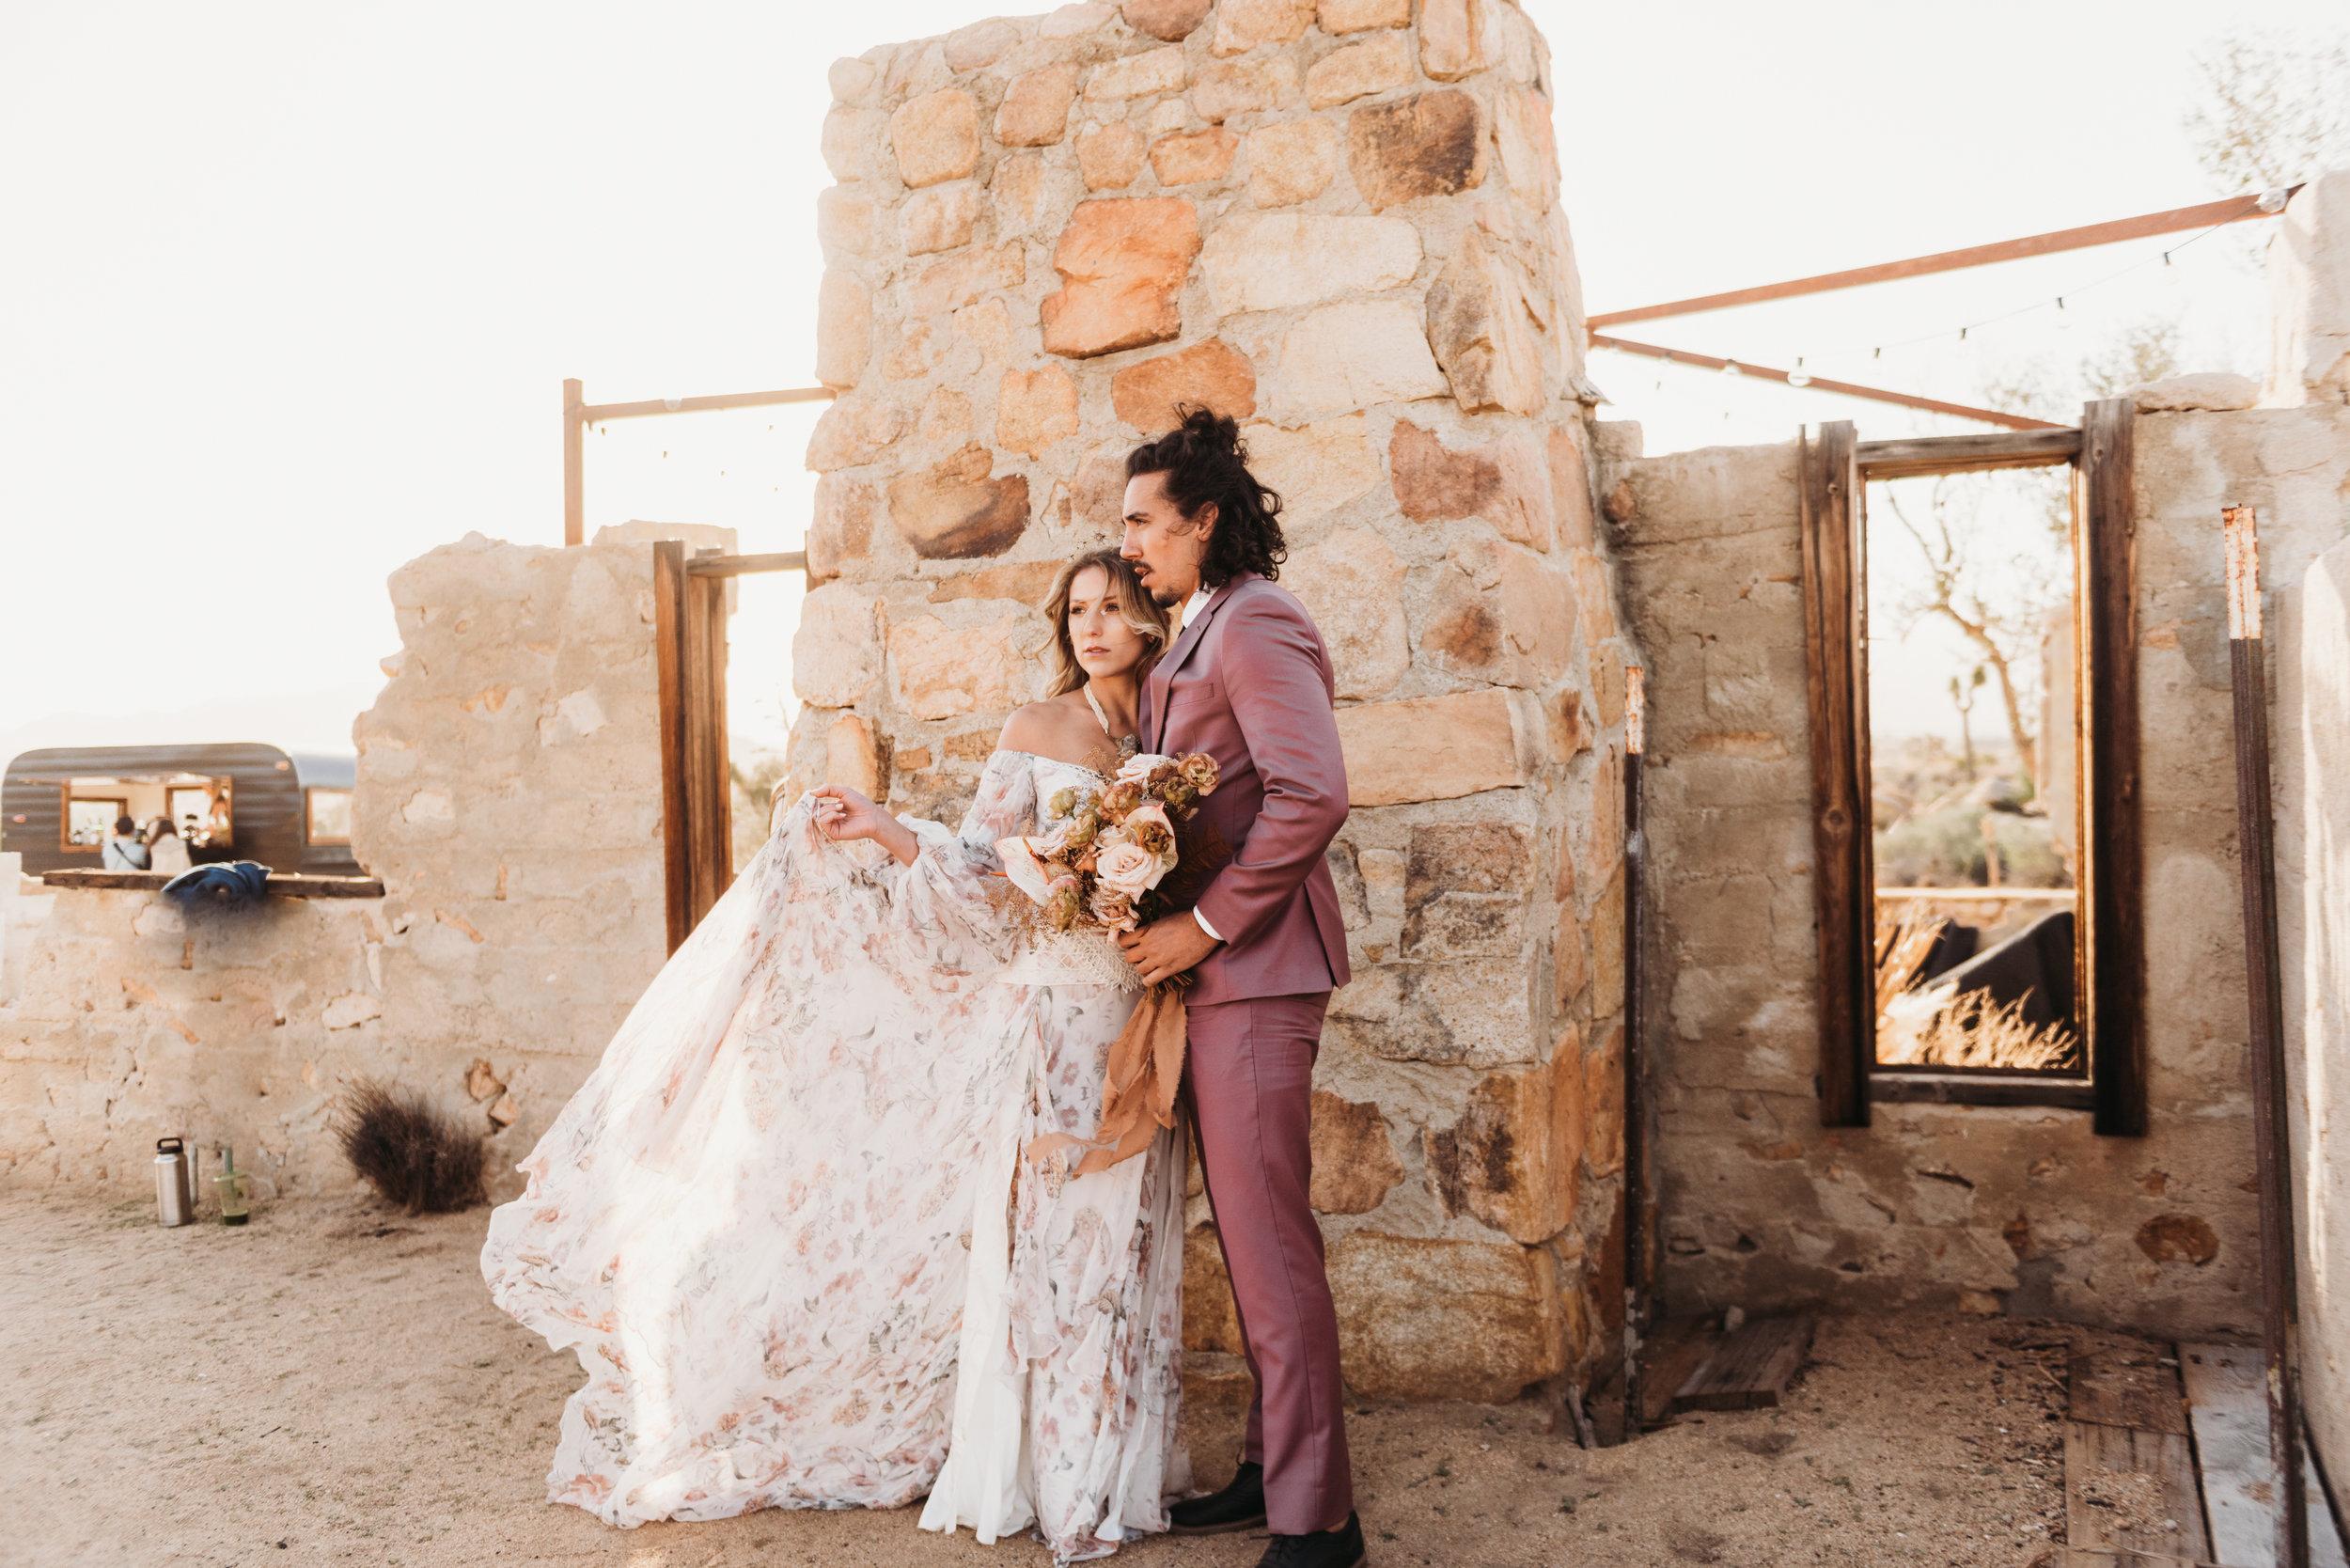 FortSt.John_photographer_TyraEPhotography_Wedding_Couple_Family_Photograhy_DawsonCreek_Elopement_Bride_Boduoir_Portraits-5033.jpg